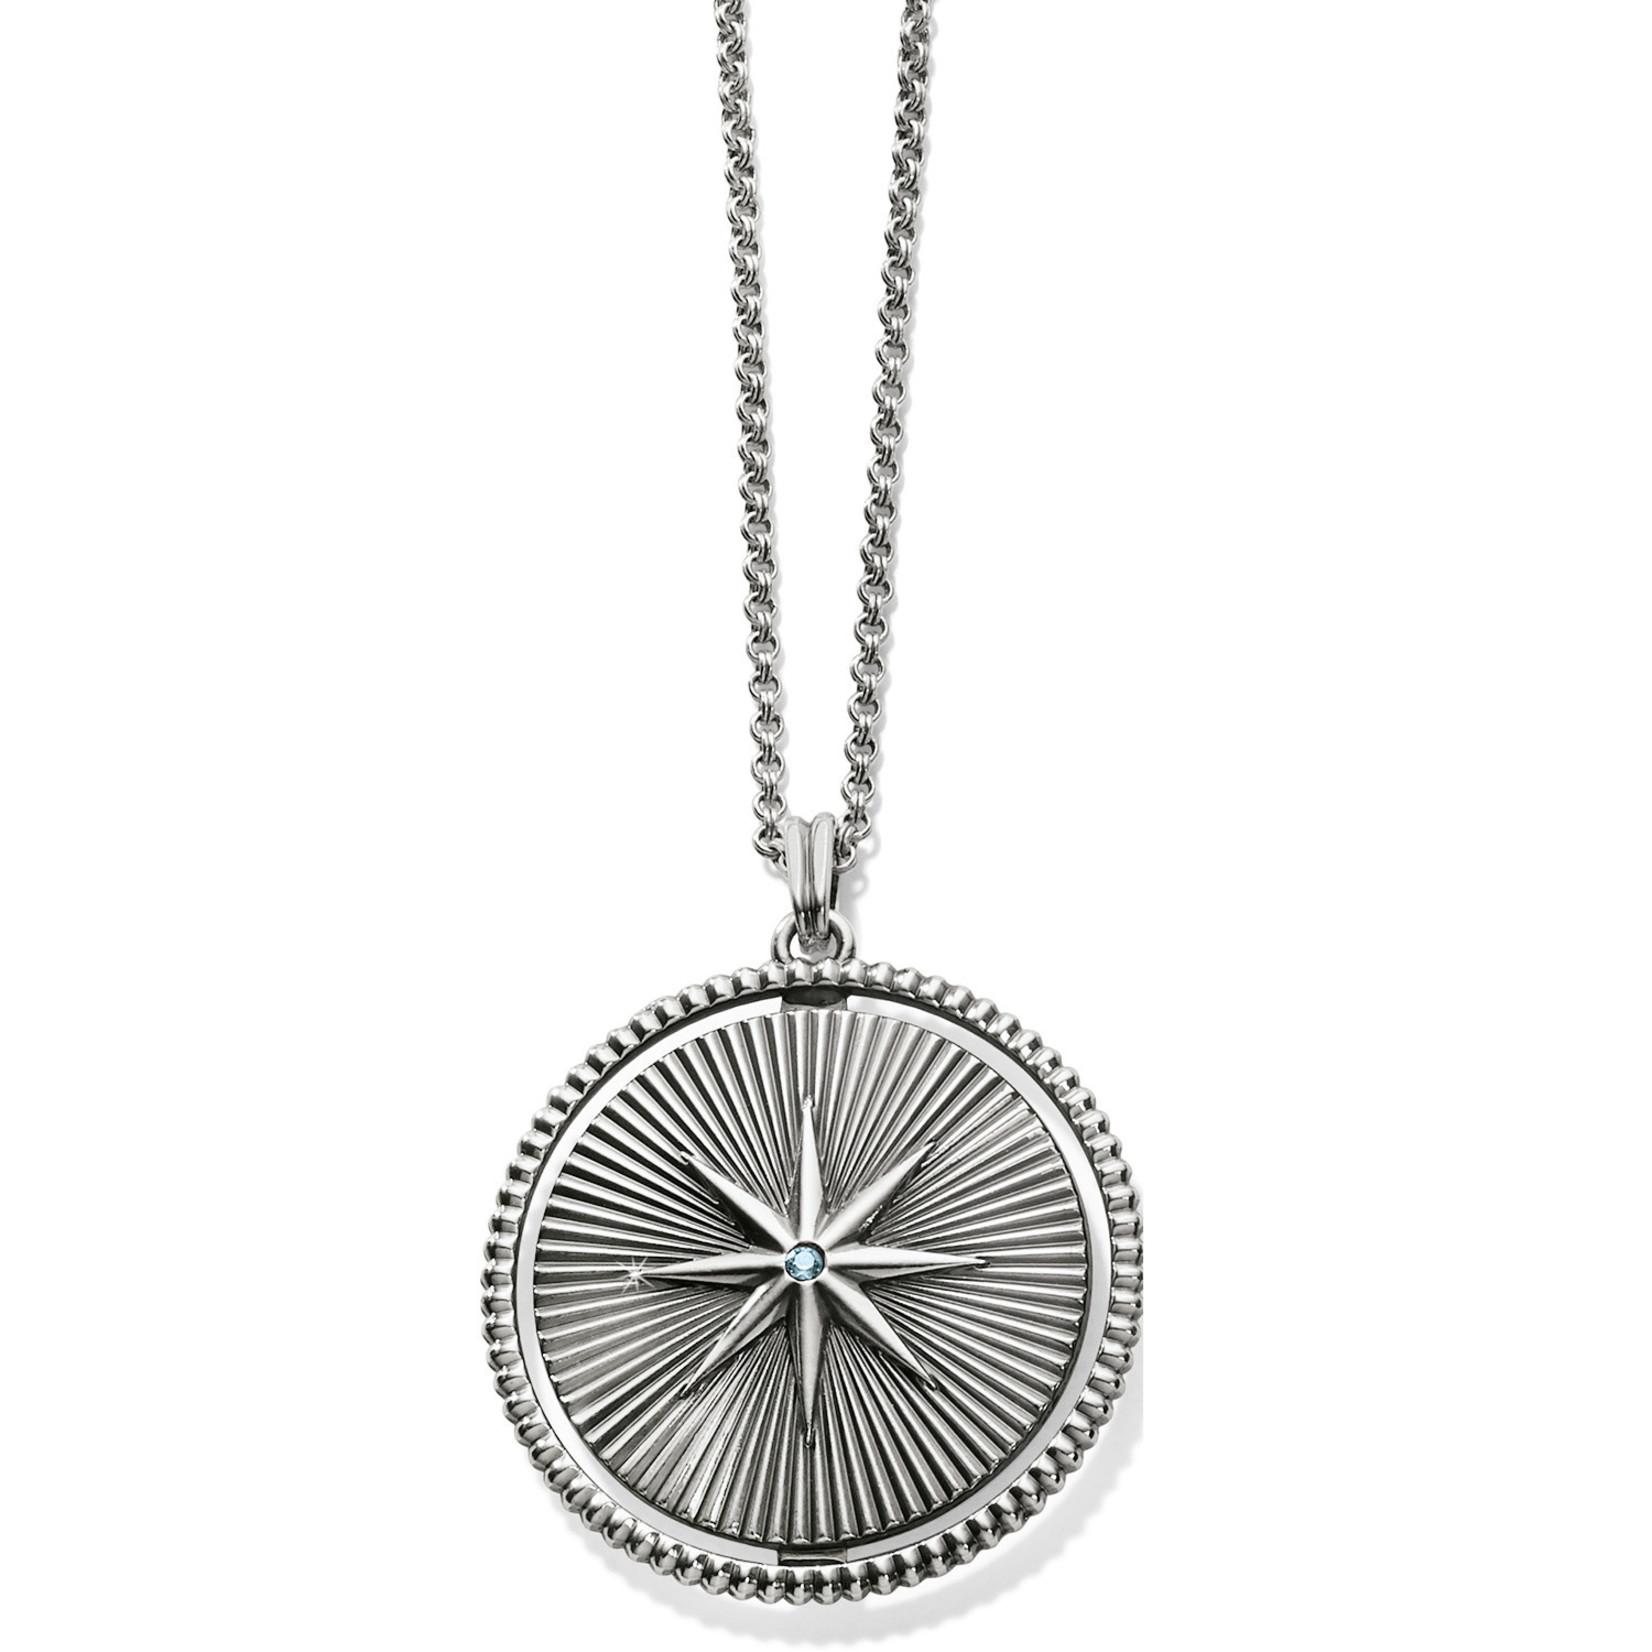 Halo Rays Round Pendant Necklace Tanzanite